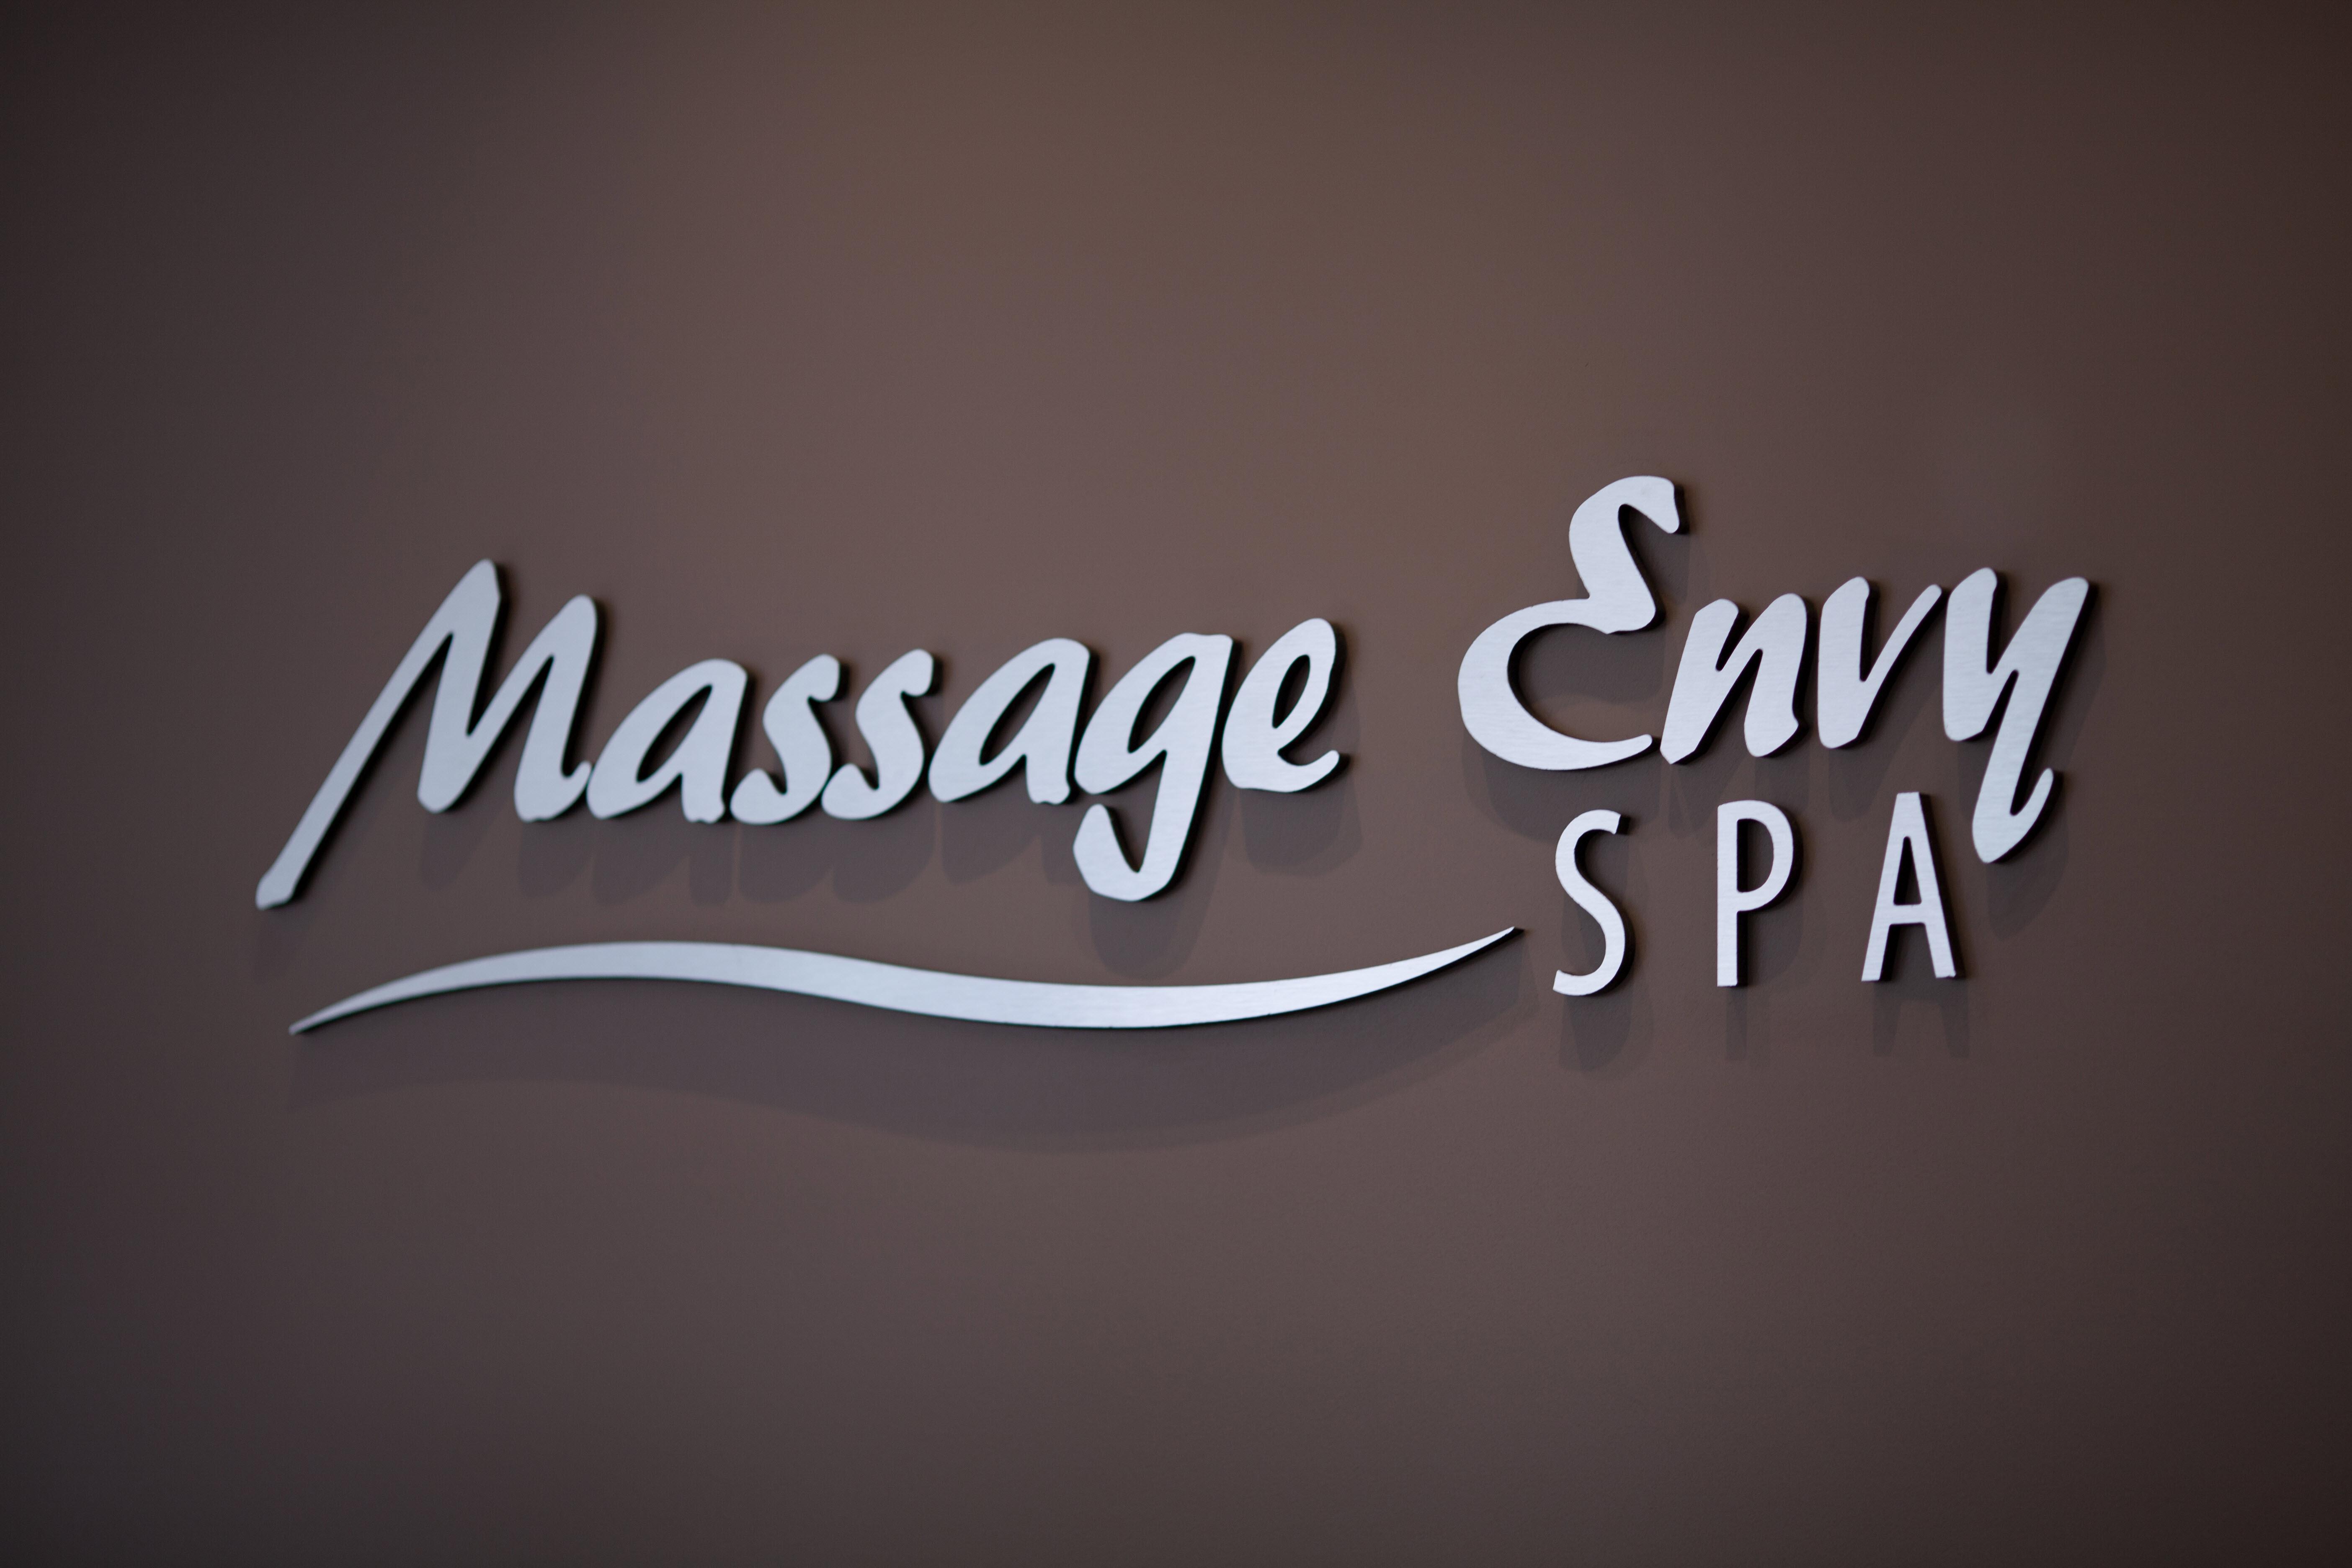 Massage Envy Spa - Springfield